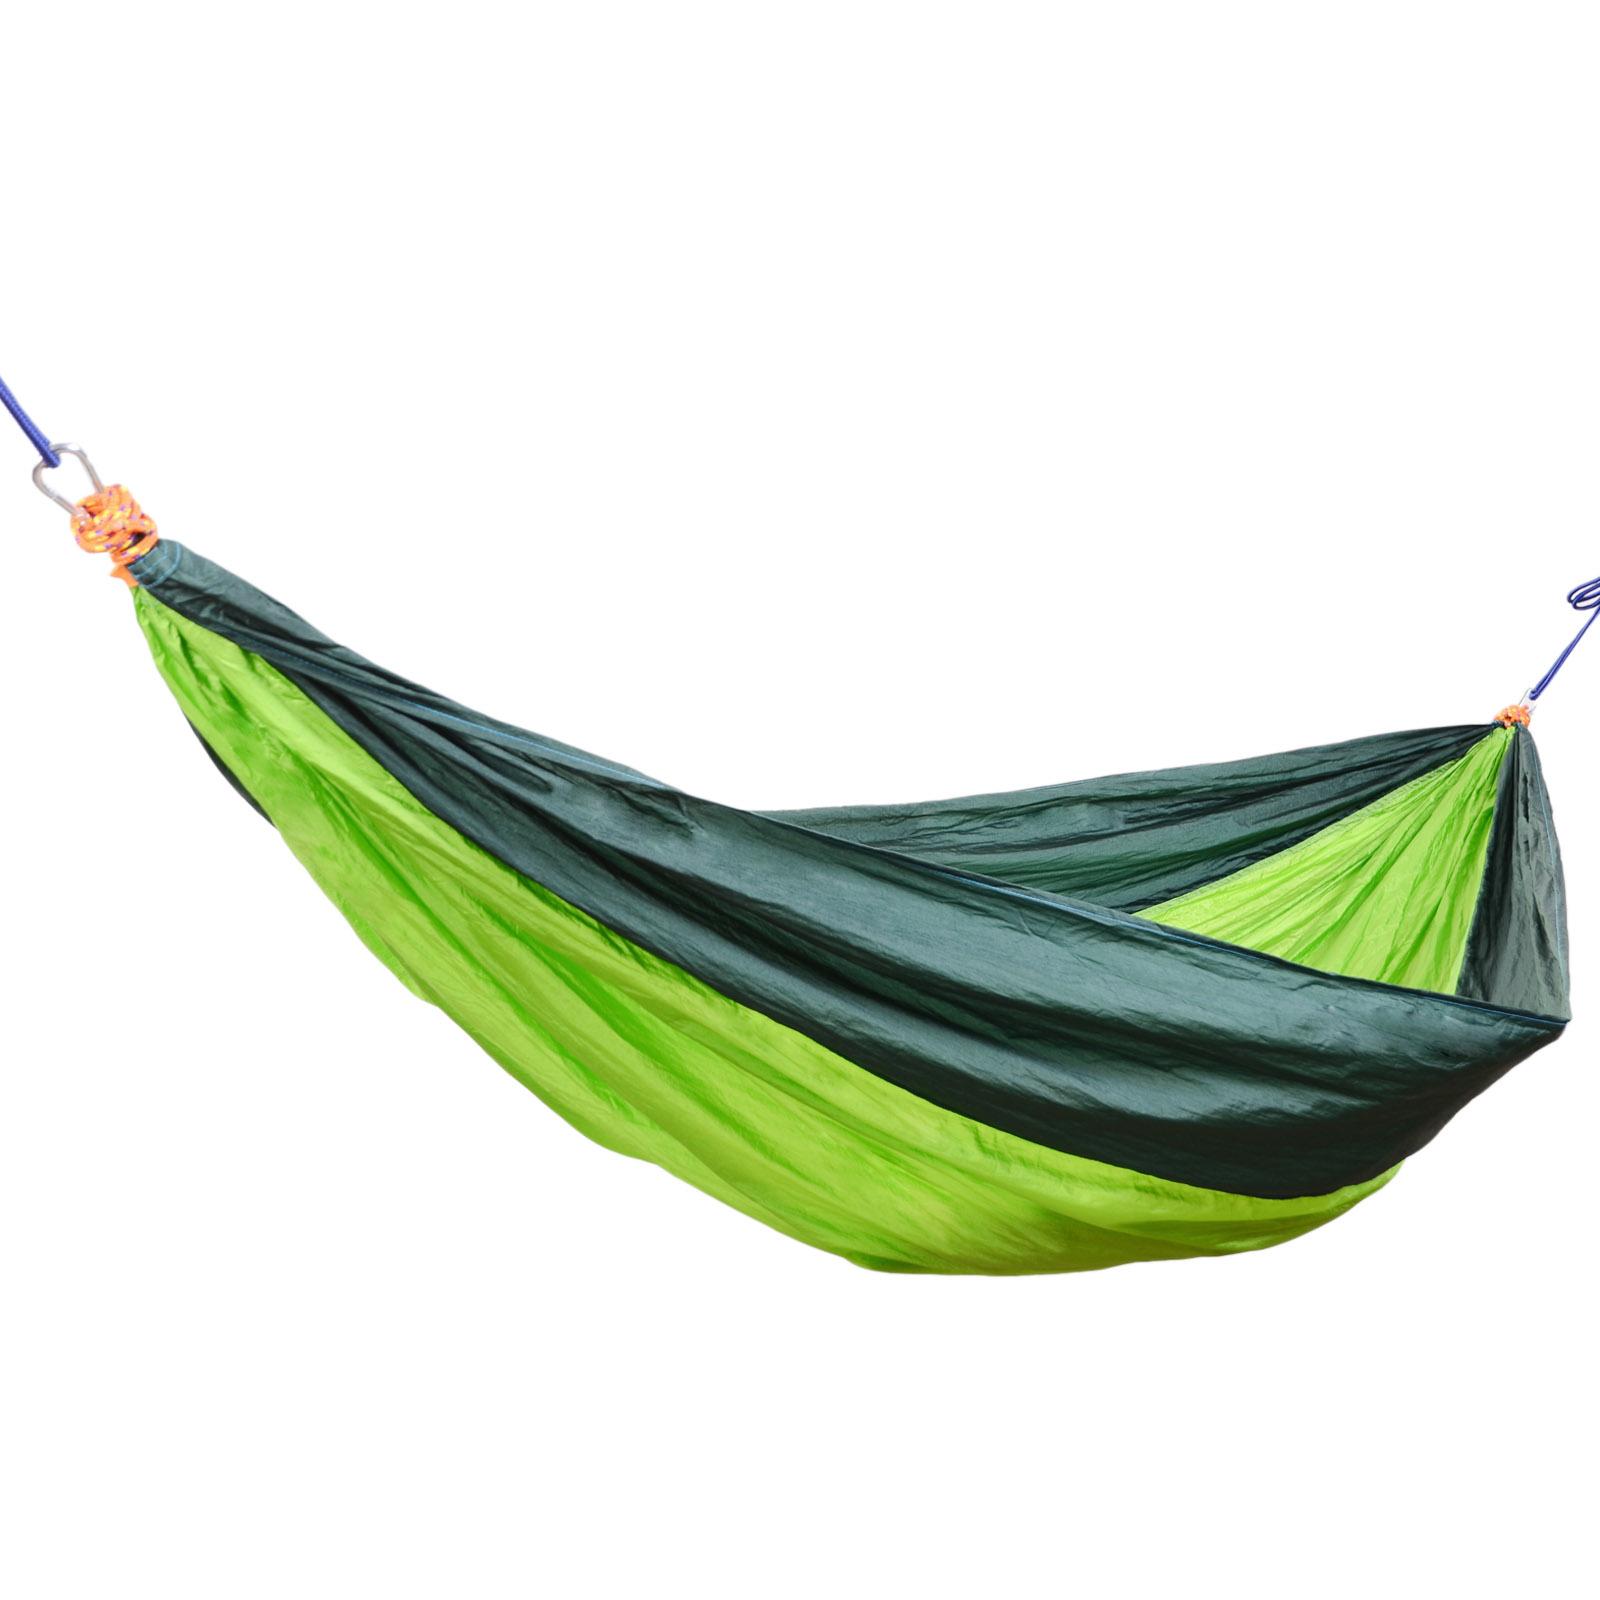 portable parachute nylon tissu hamac deux personnes voyage camping choix ebay. Black Bedroom Furniture Sets. Home Design Ideas